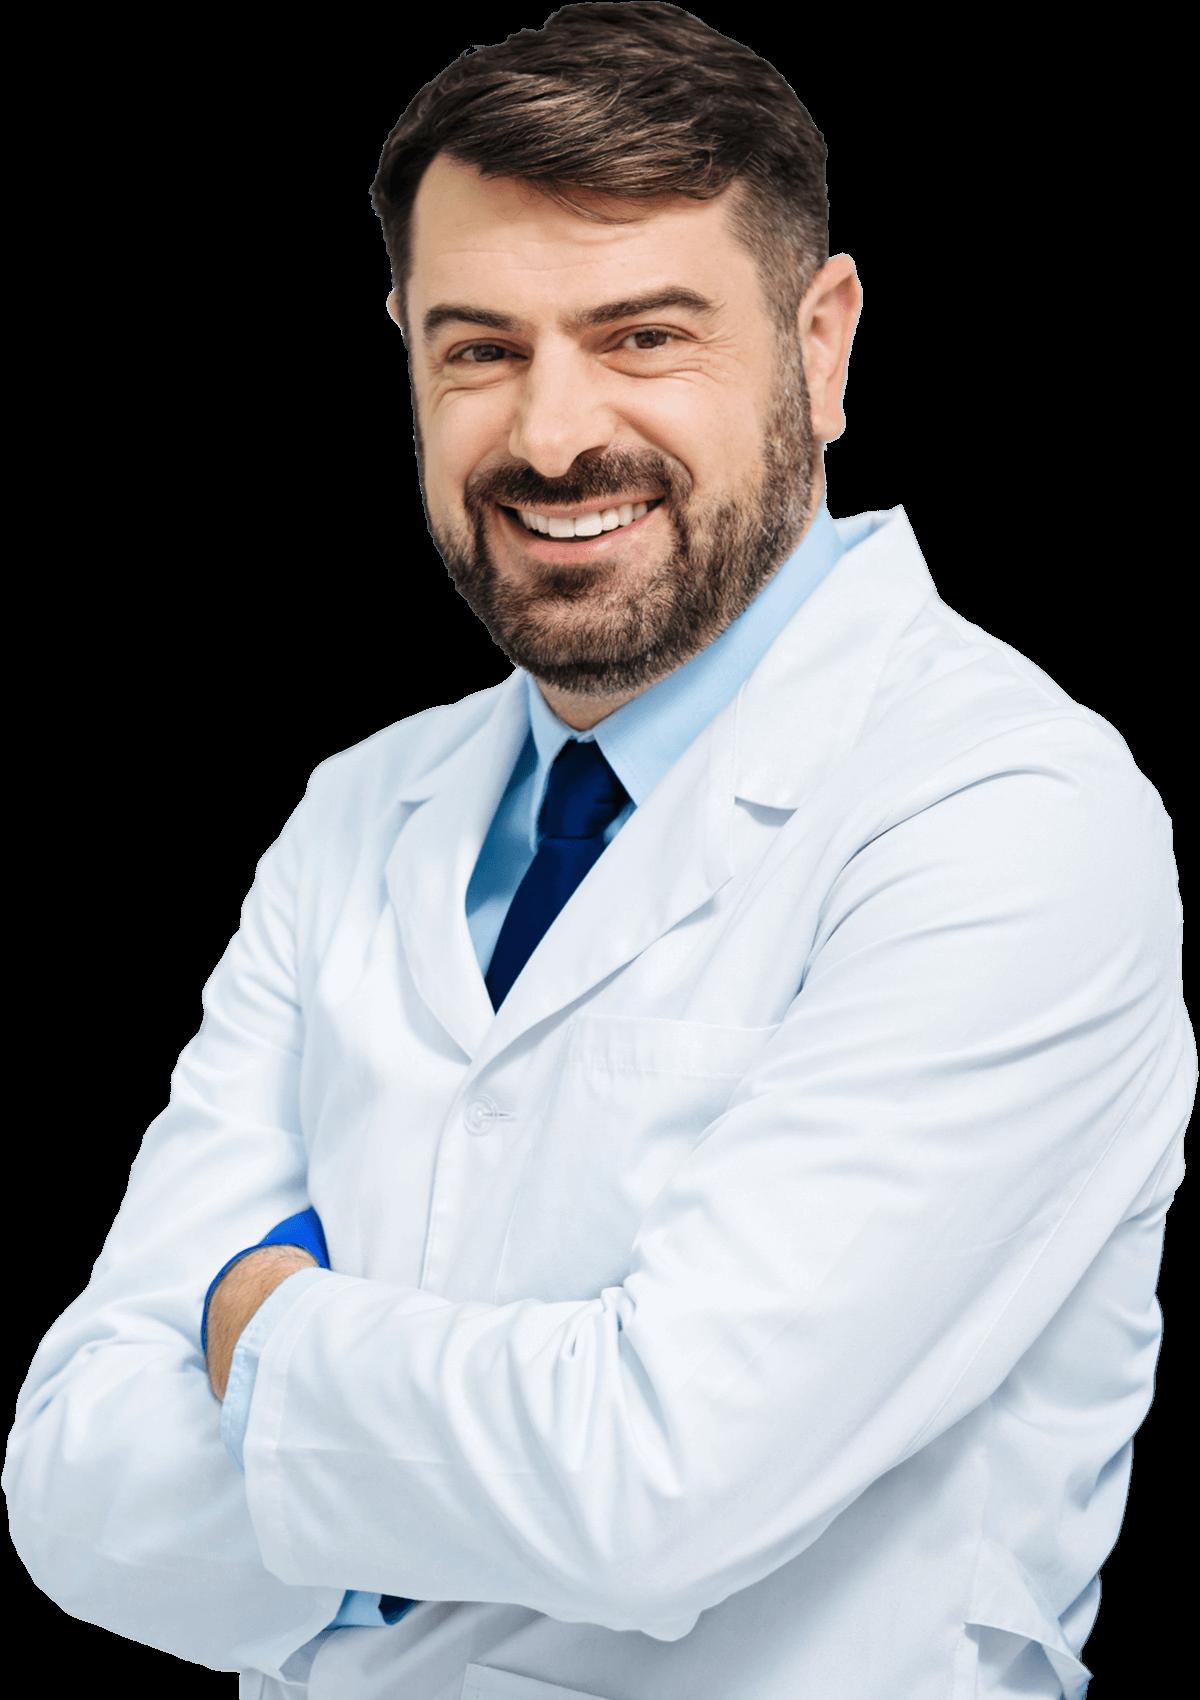 https://zahn-arzt-ungarn.ch/wp-content/uploads/2020/02/doctor-2.png